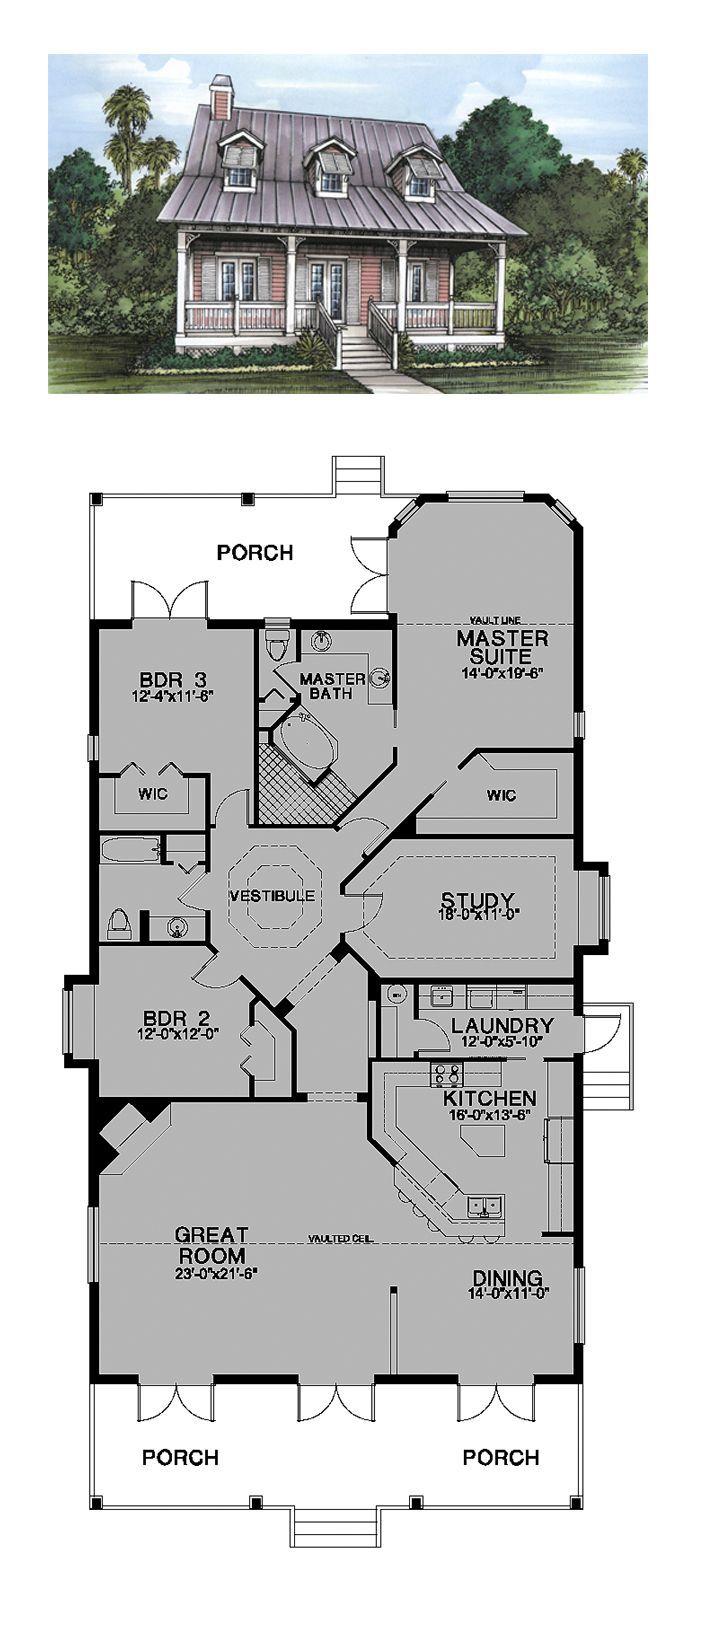 Pin by Shiloh Doerhring on Z House - Layouts in 2019   House ... Z House Plans on vardo camper plans, biltmore estate elevation plans, new house design plans, floating dock plans,